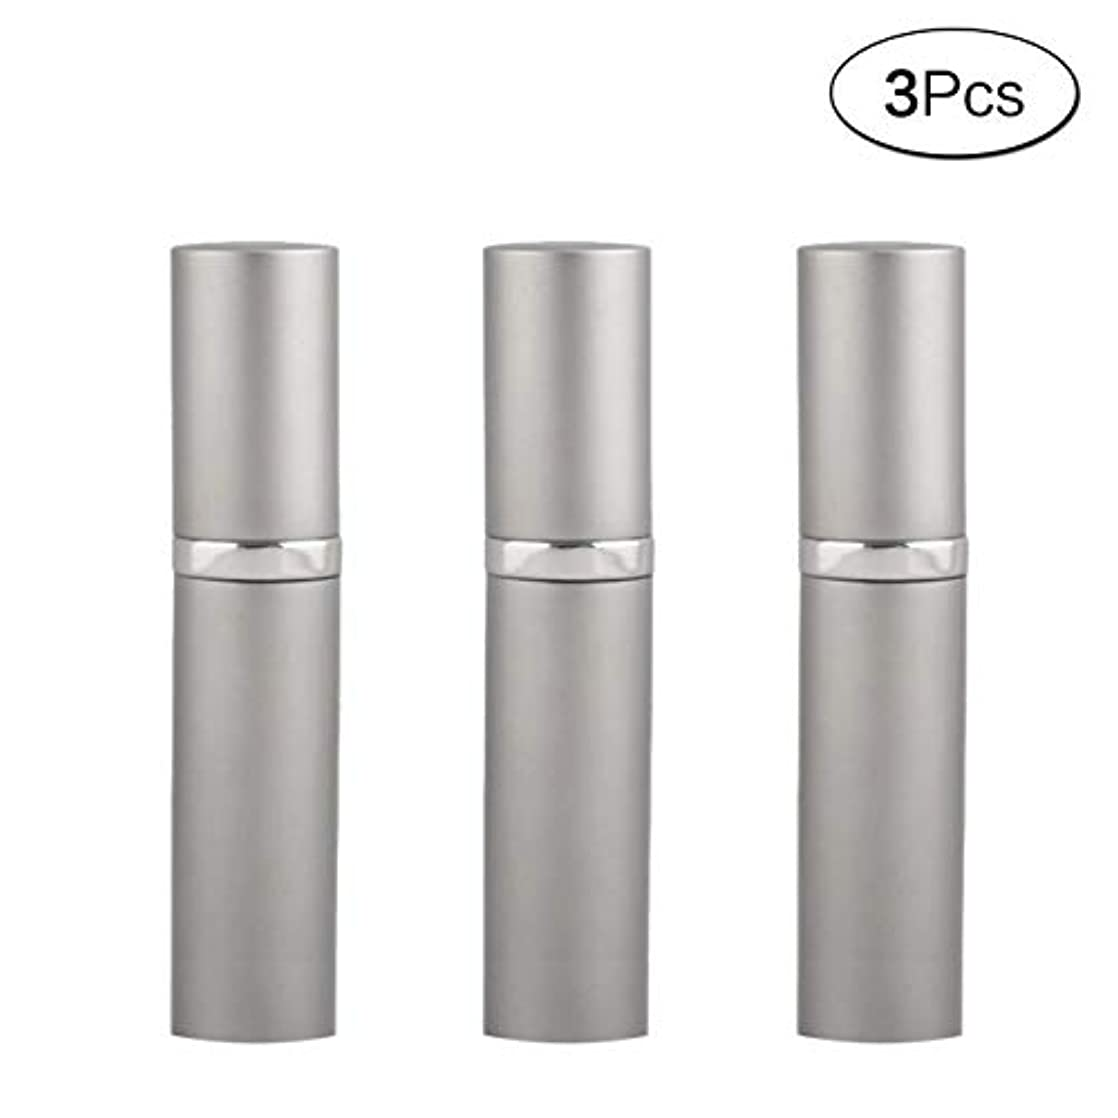 5ML アトマイザ- 詰め替え ポータブル クイック 香水噴霧器 携帯用 詰め替え容器 (グレ-Gray) 3本